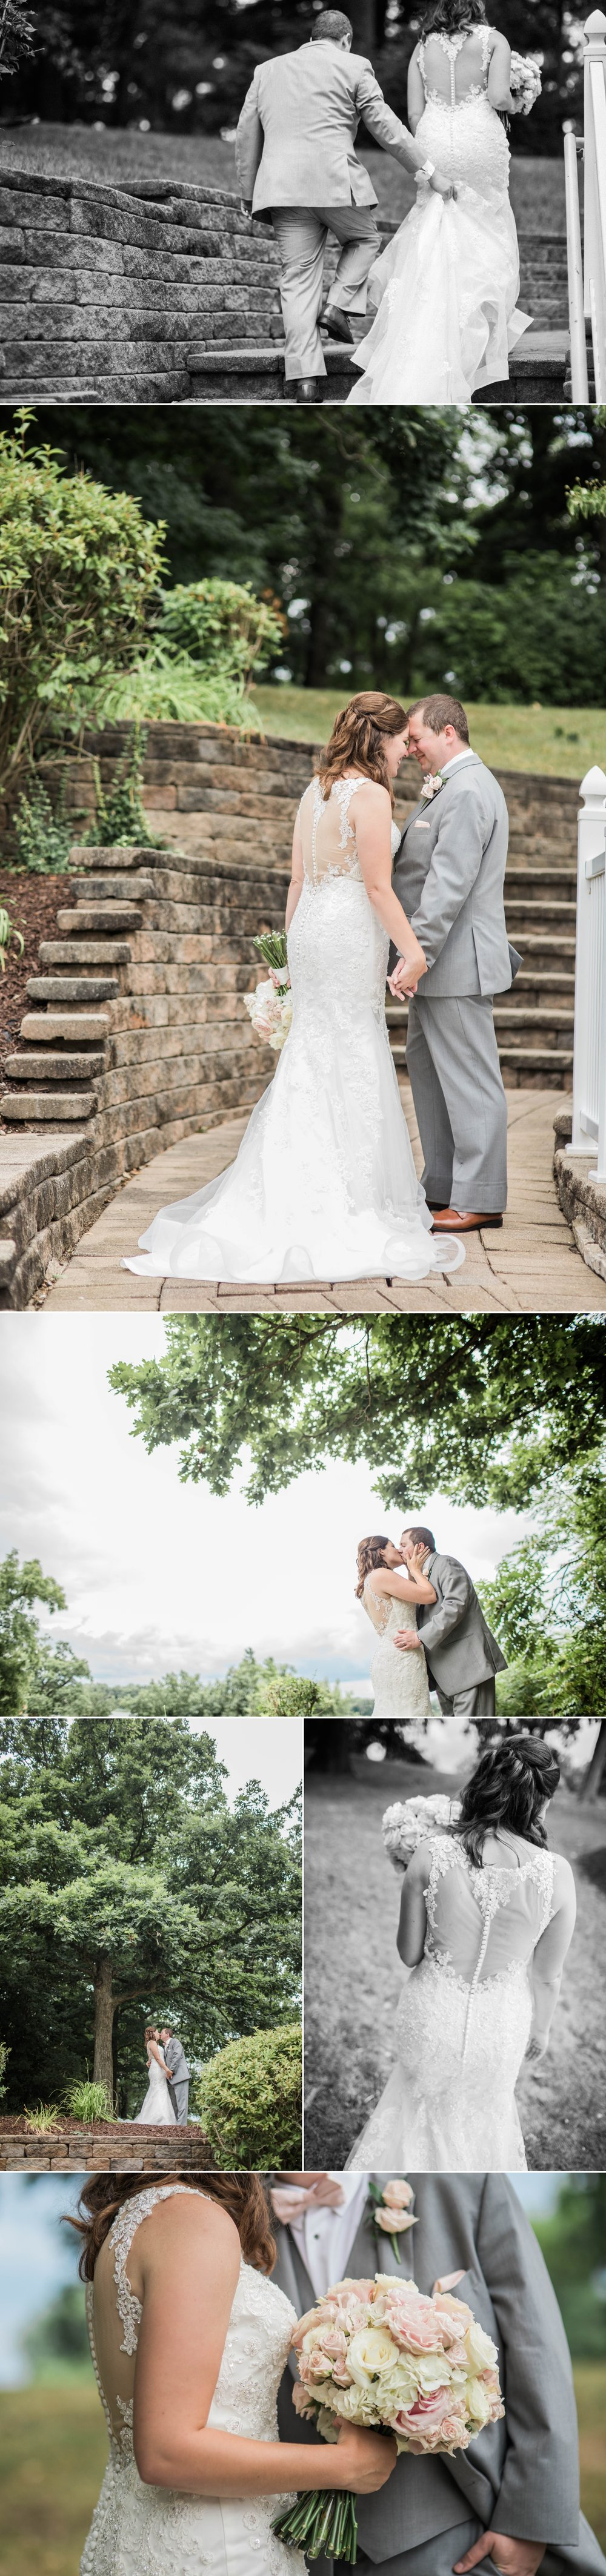 lake wawasee oakwood resort wedding indiana bride groom hilltop portraits